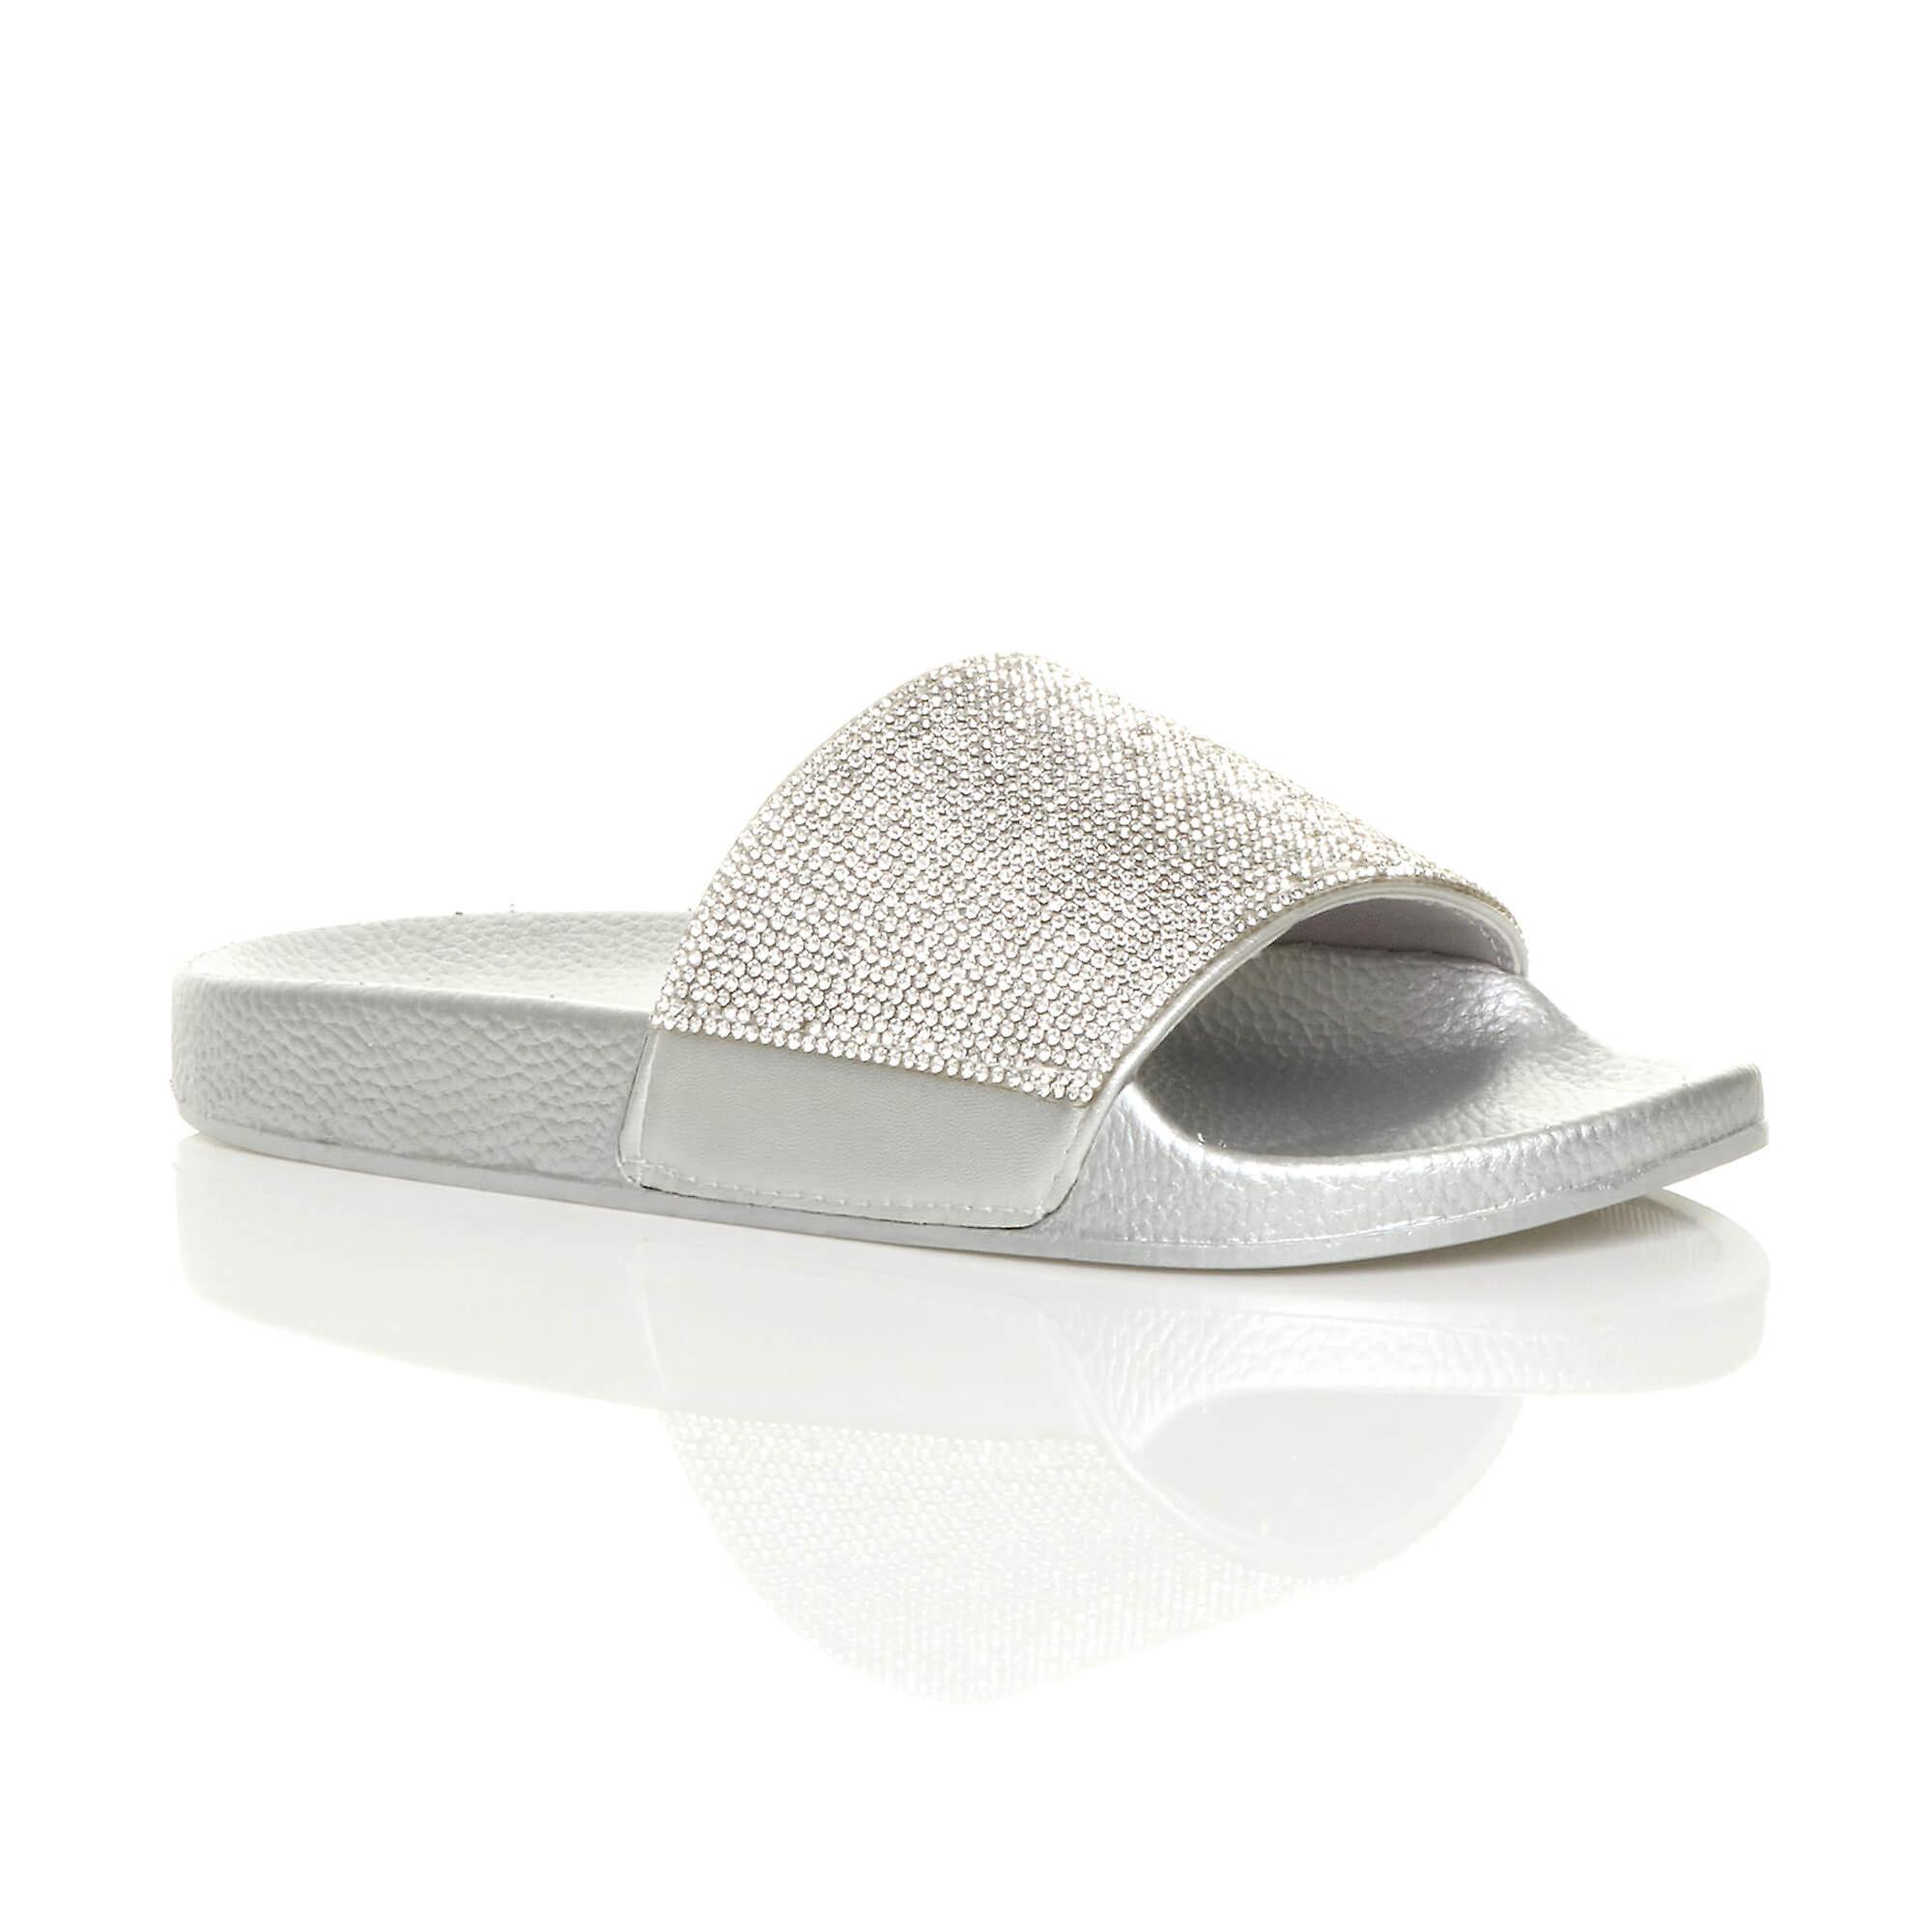 81c793fddcc45 Ajvani womens flat sliders slip on diamante mule sparkly sandals flip flops  slippers